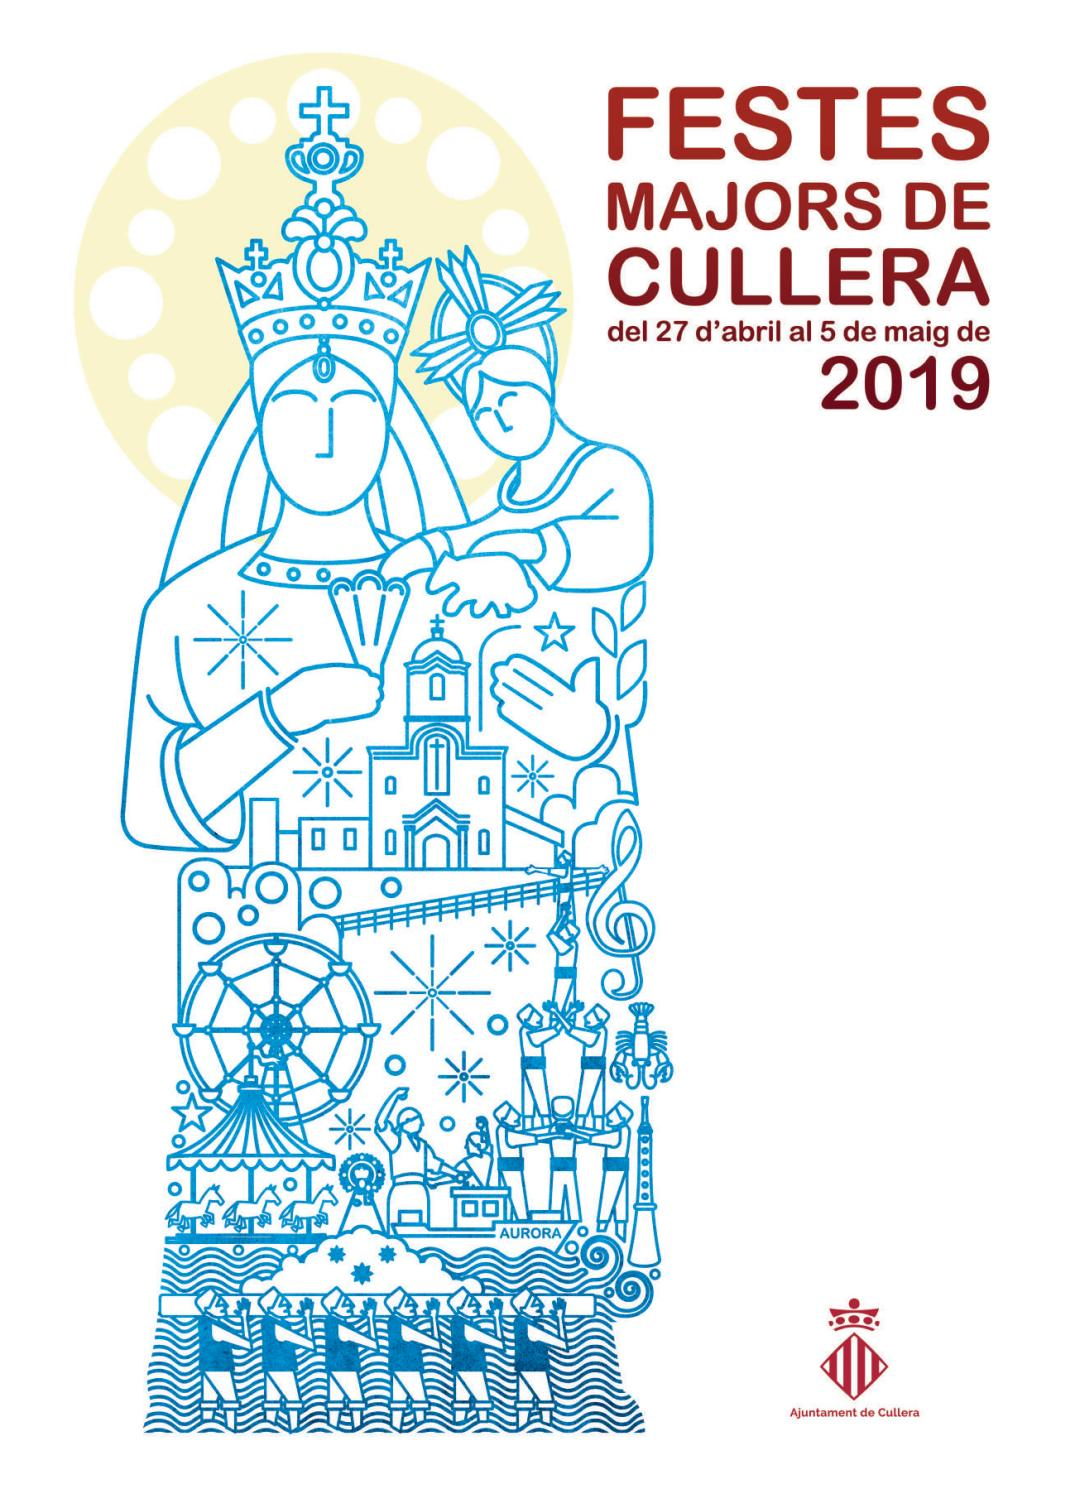 LLIBRE FESTES MAJORS CULLERA 2019 by cullera4 issuu